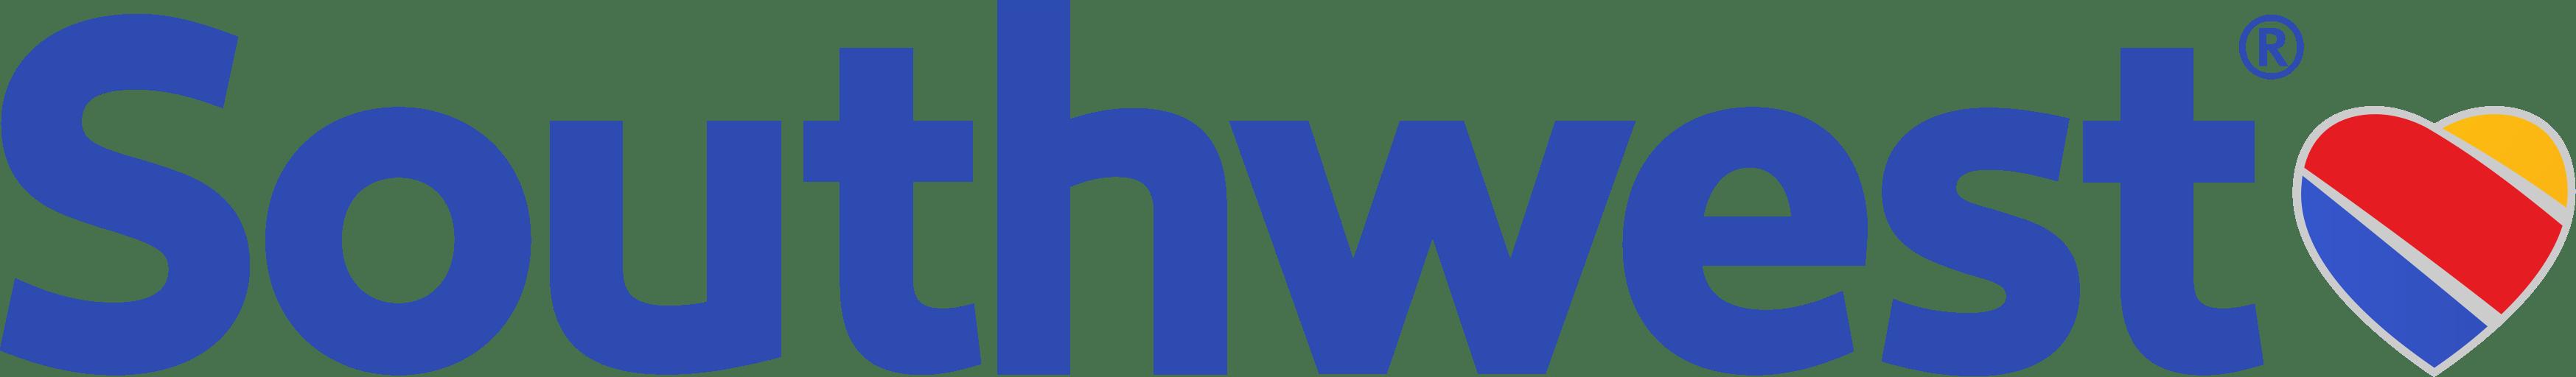 Southwest Airlines Logo transparent PNG - StickPNG